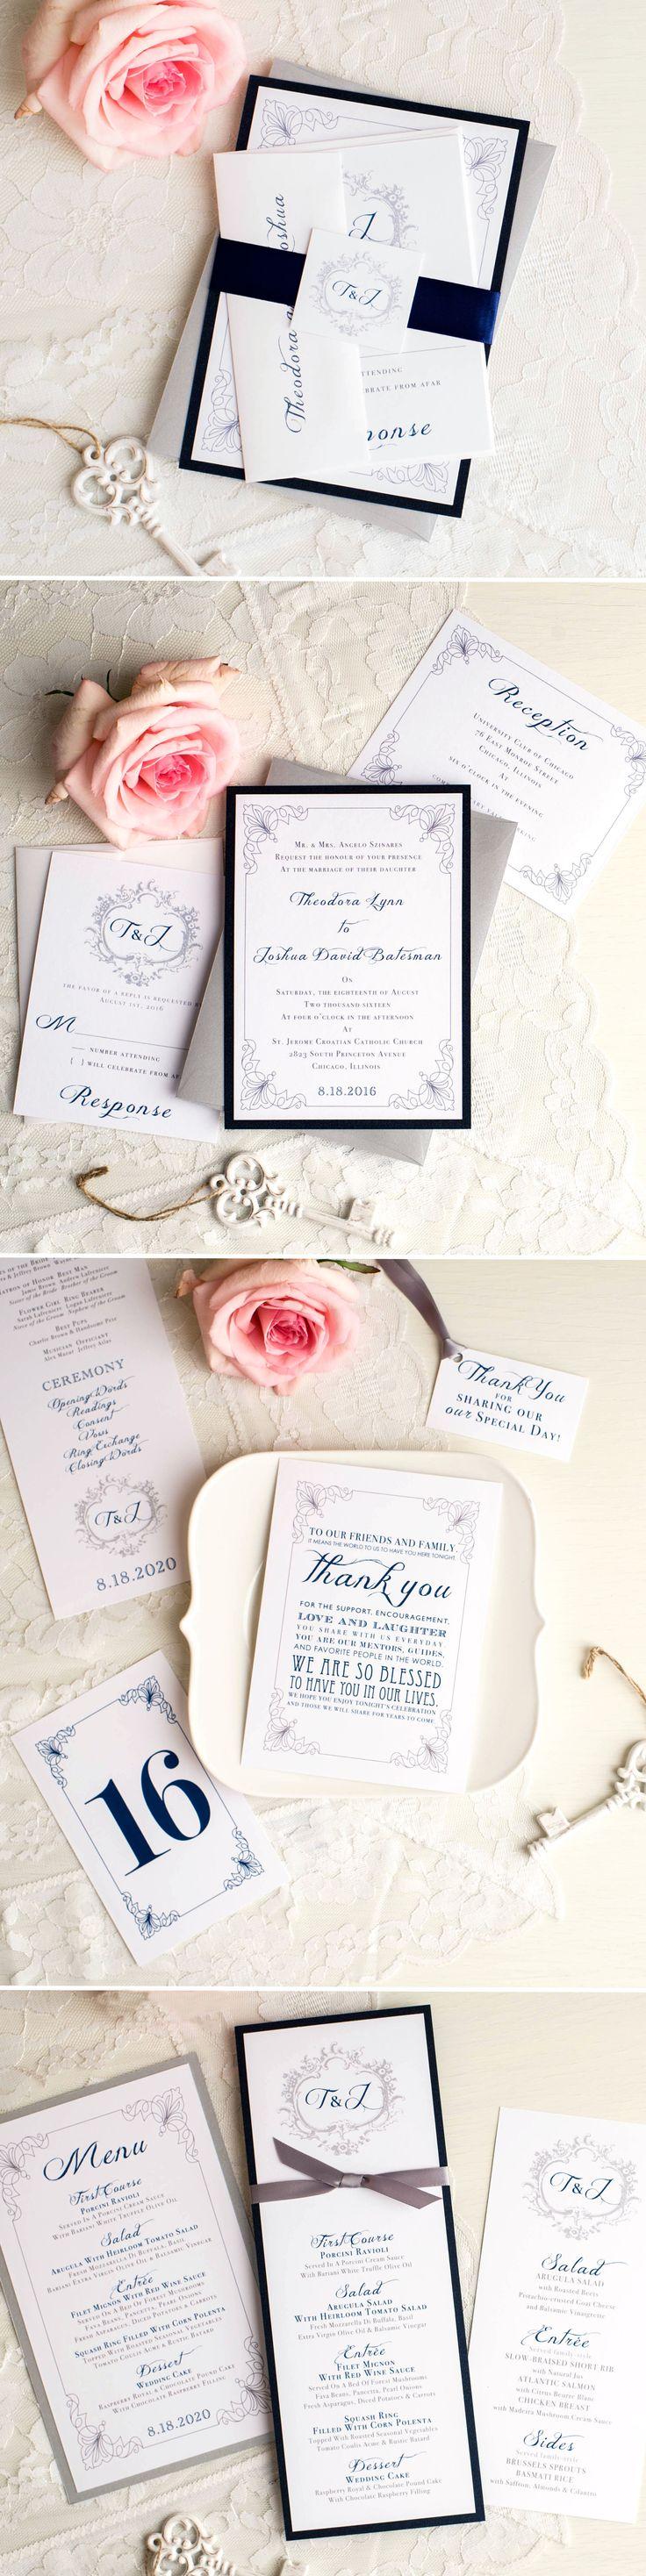 446 best Wedding & Event Inspo images on Pinterest | Table ...